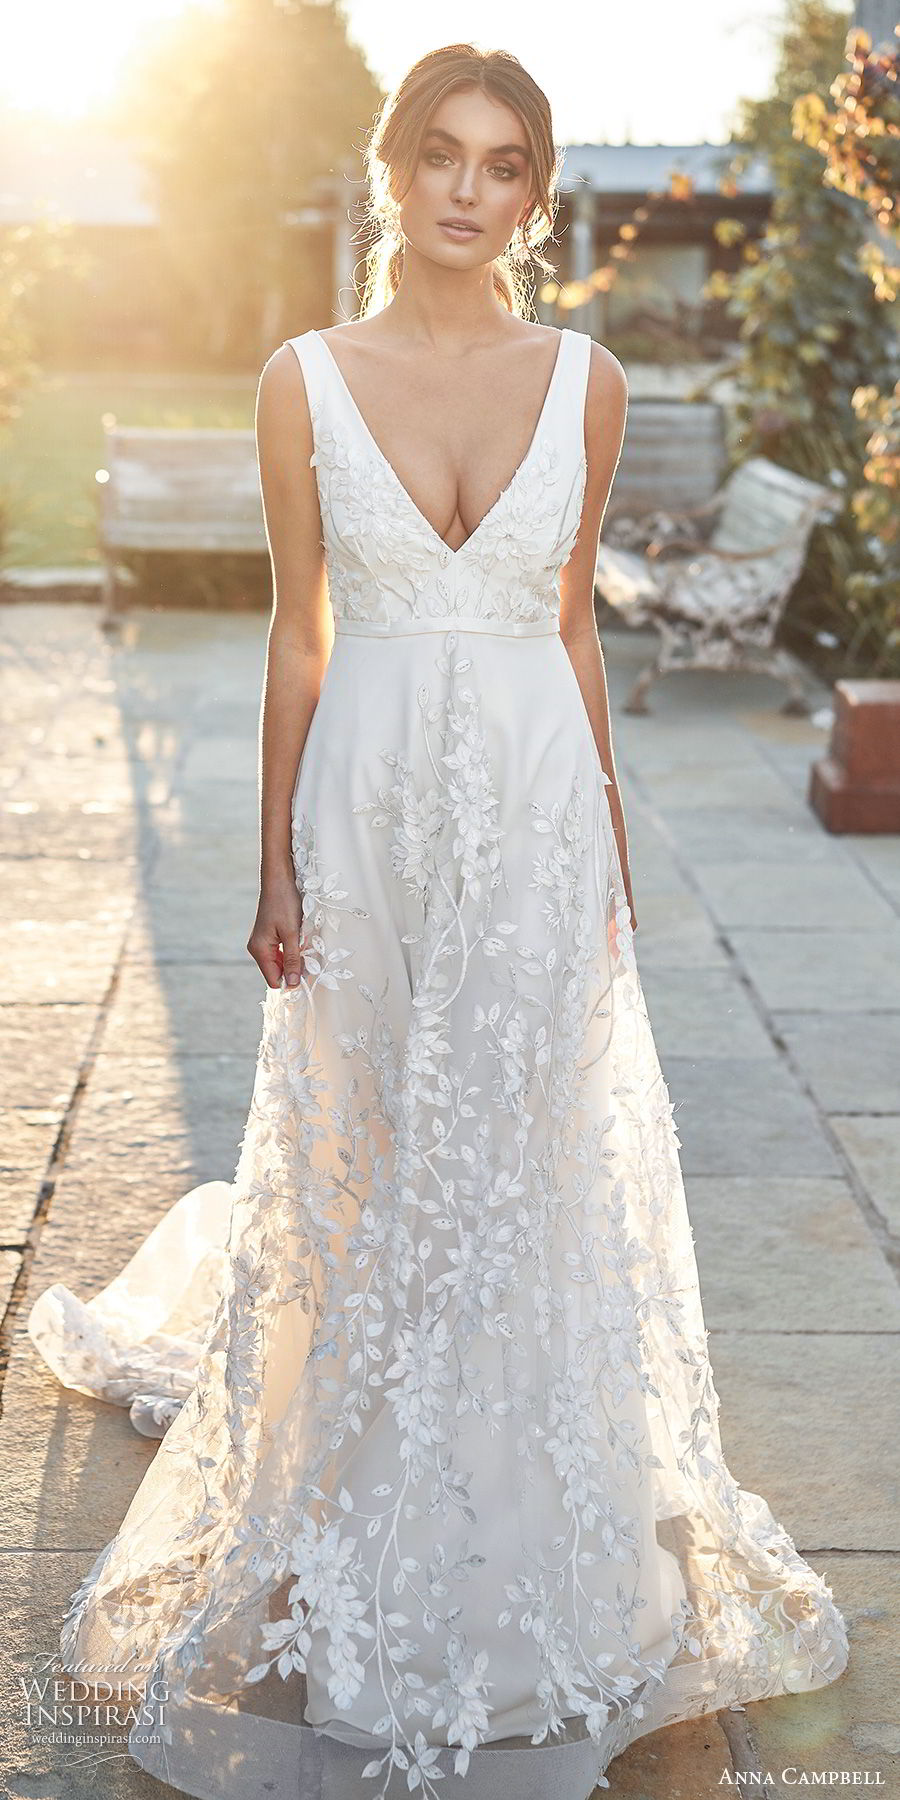 anna campbell 2020 bridal sleeveless thick straps plunging v neckline fully embellished a line wedding dress (14) elegant romantic open back chapel train mv